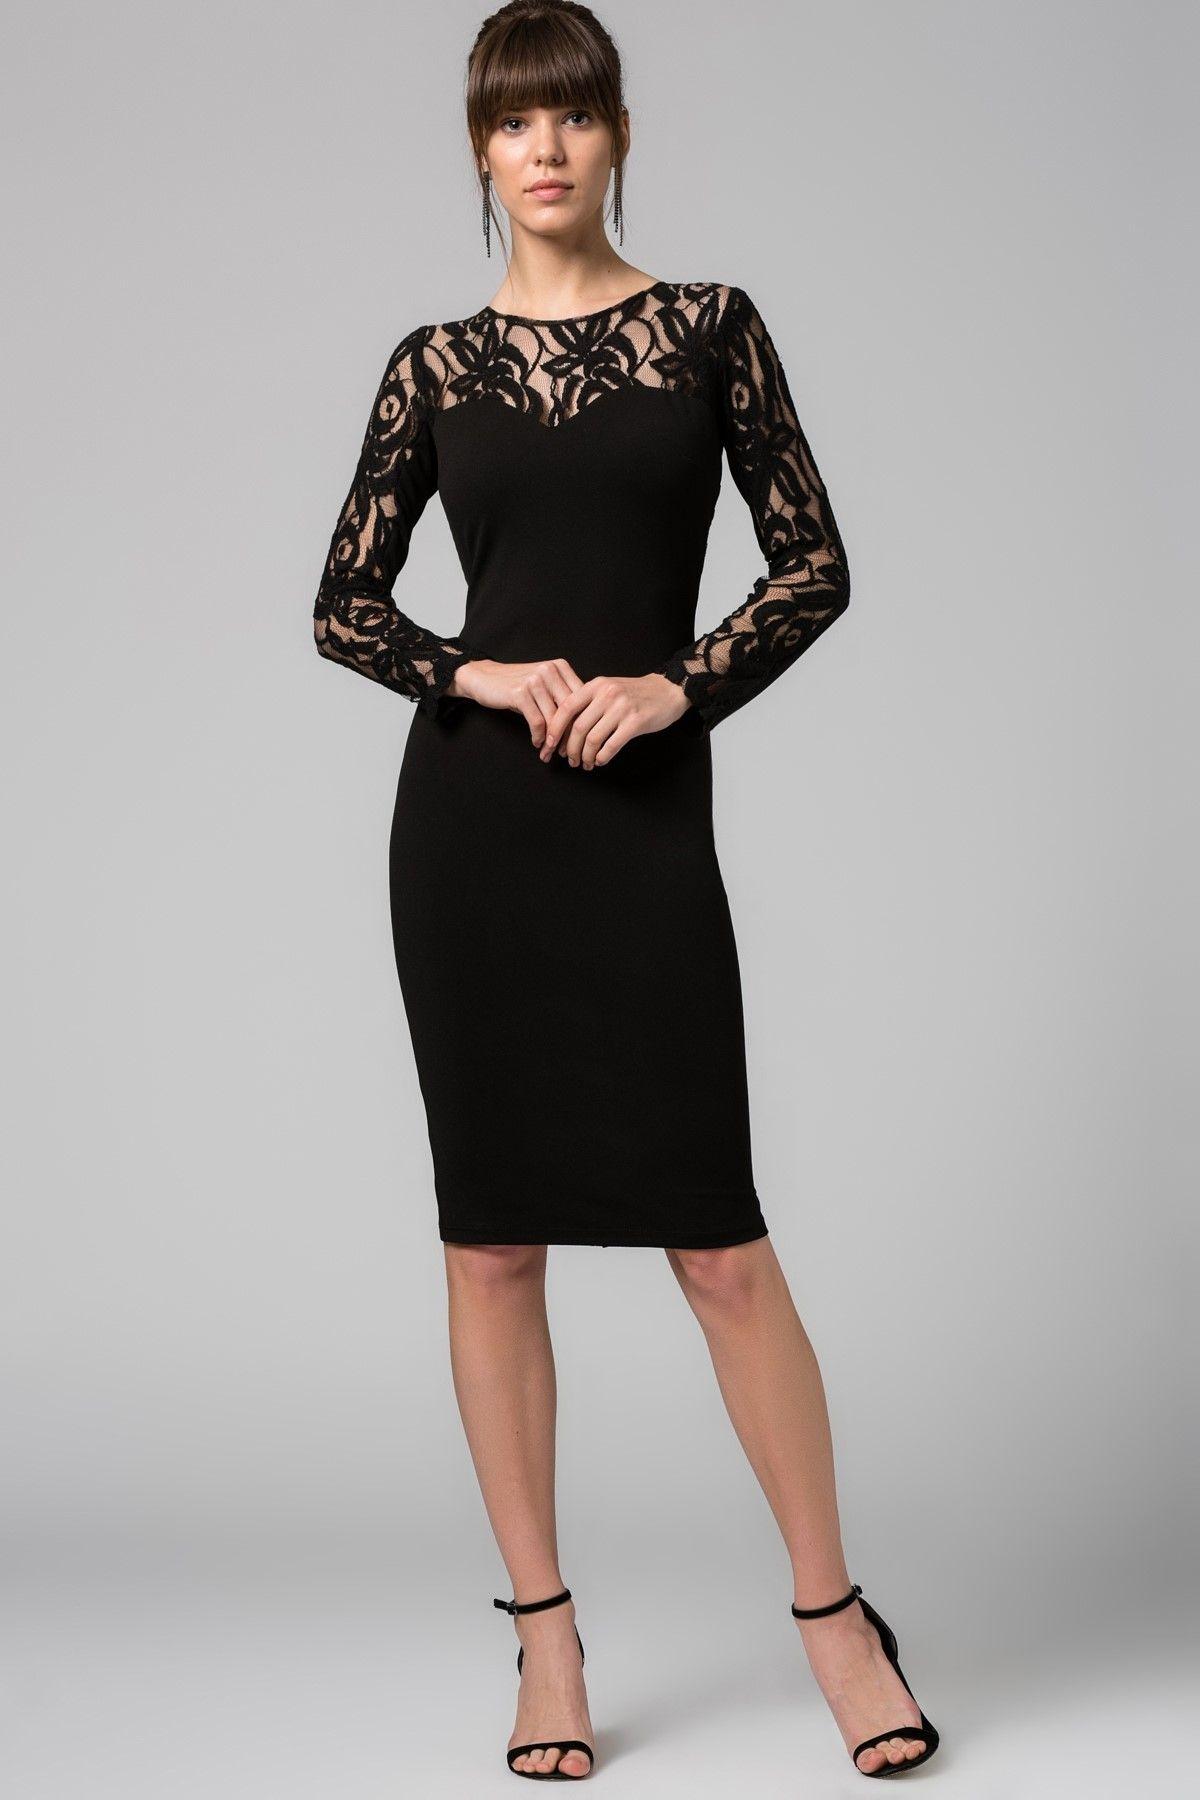 Dantel Uzeri Nakis Detayli Siyah Elbise Mlwss16fz1268 Siyah Dantel Elbiseler Elbise Siyah Elbise